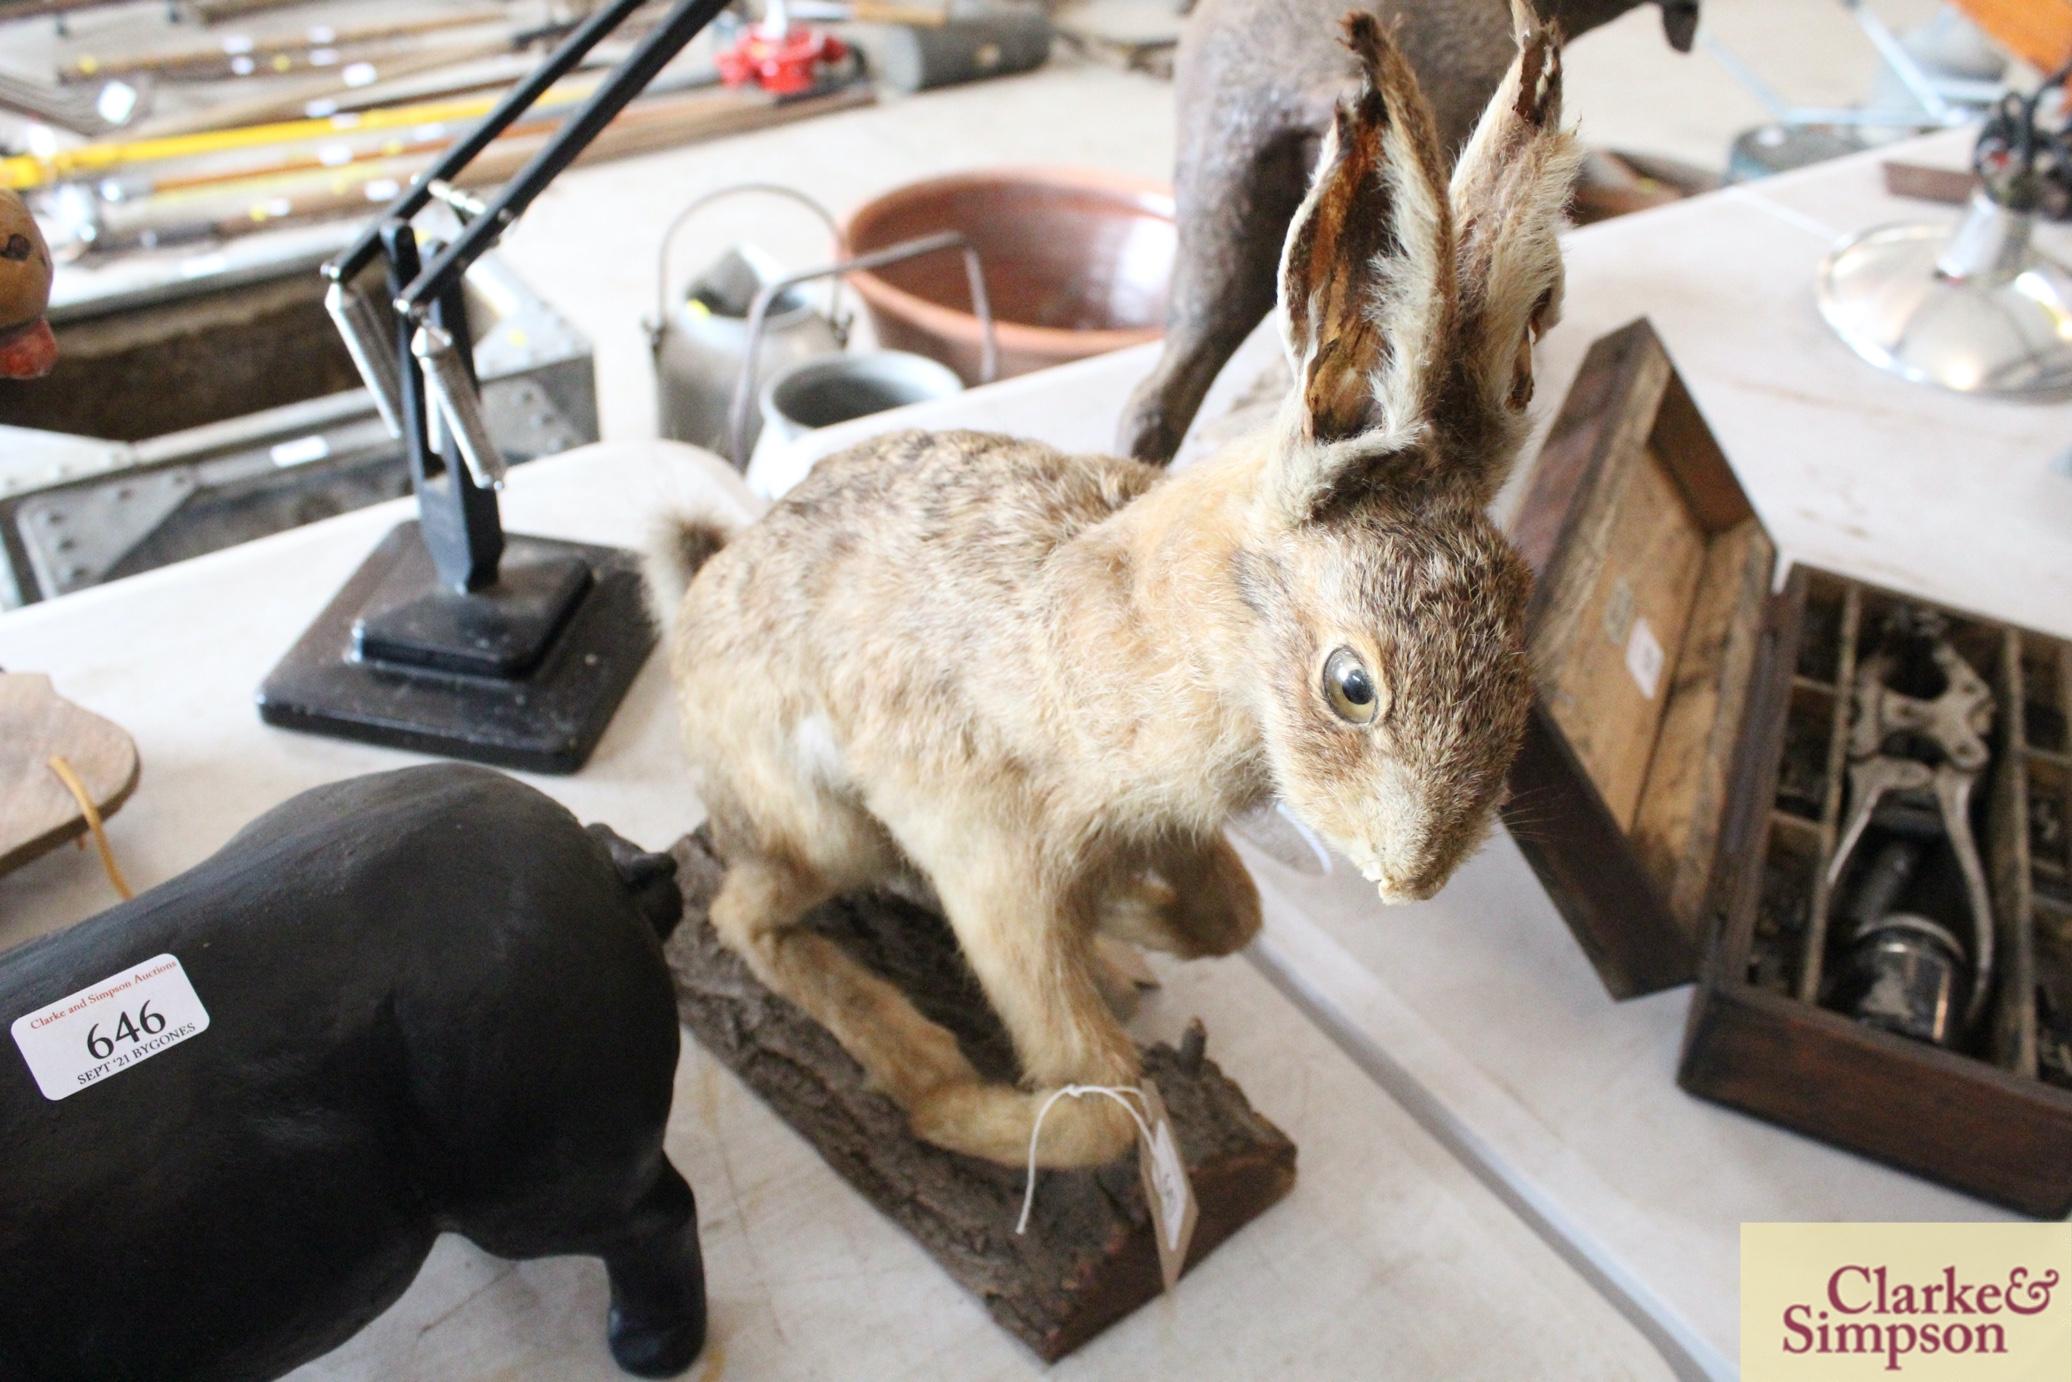 A taxidermy hare on a log